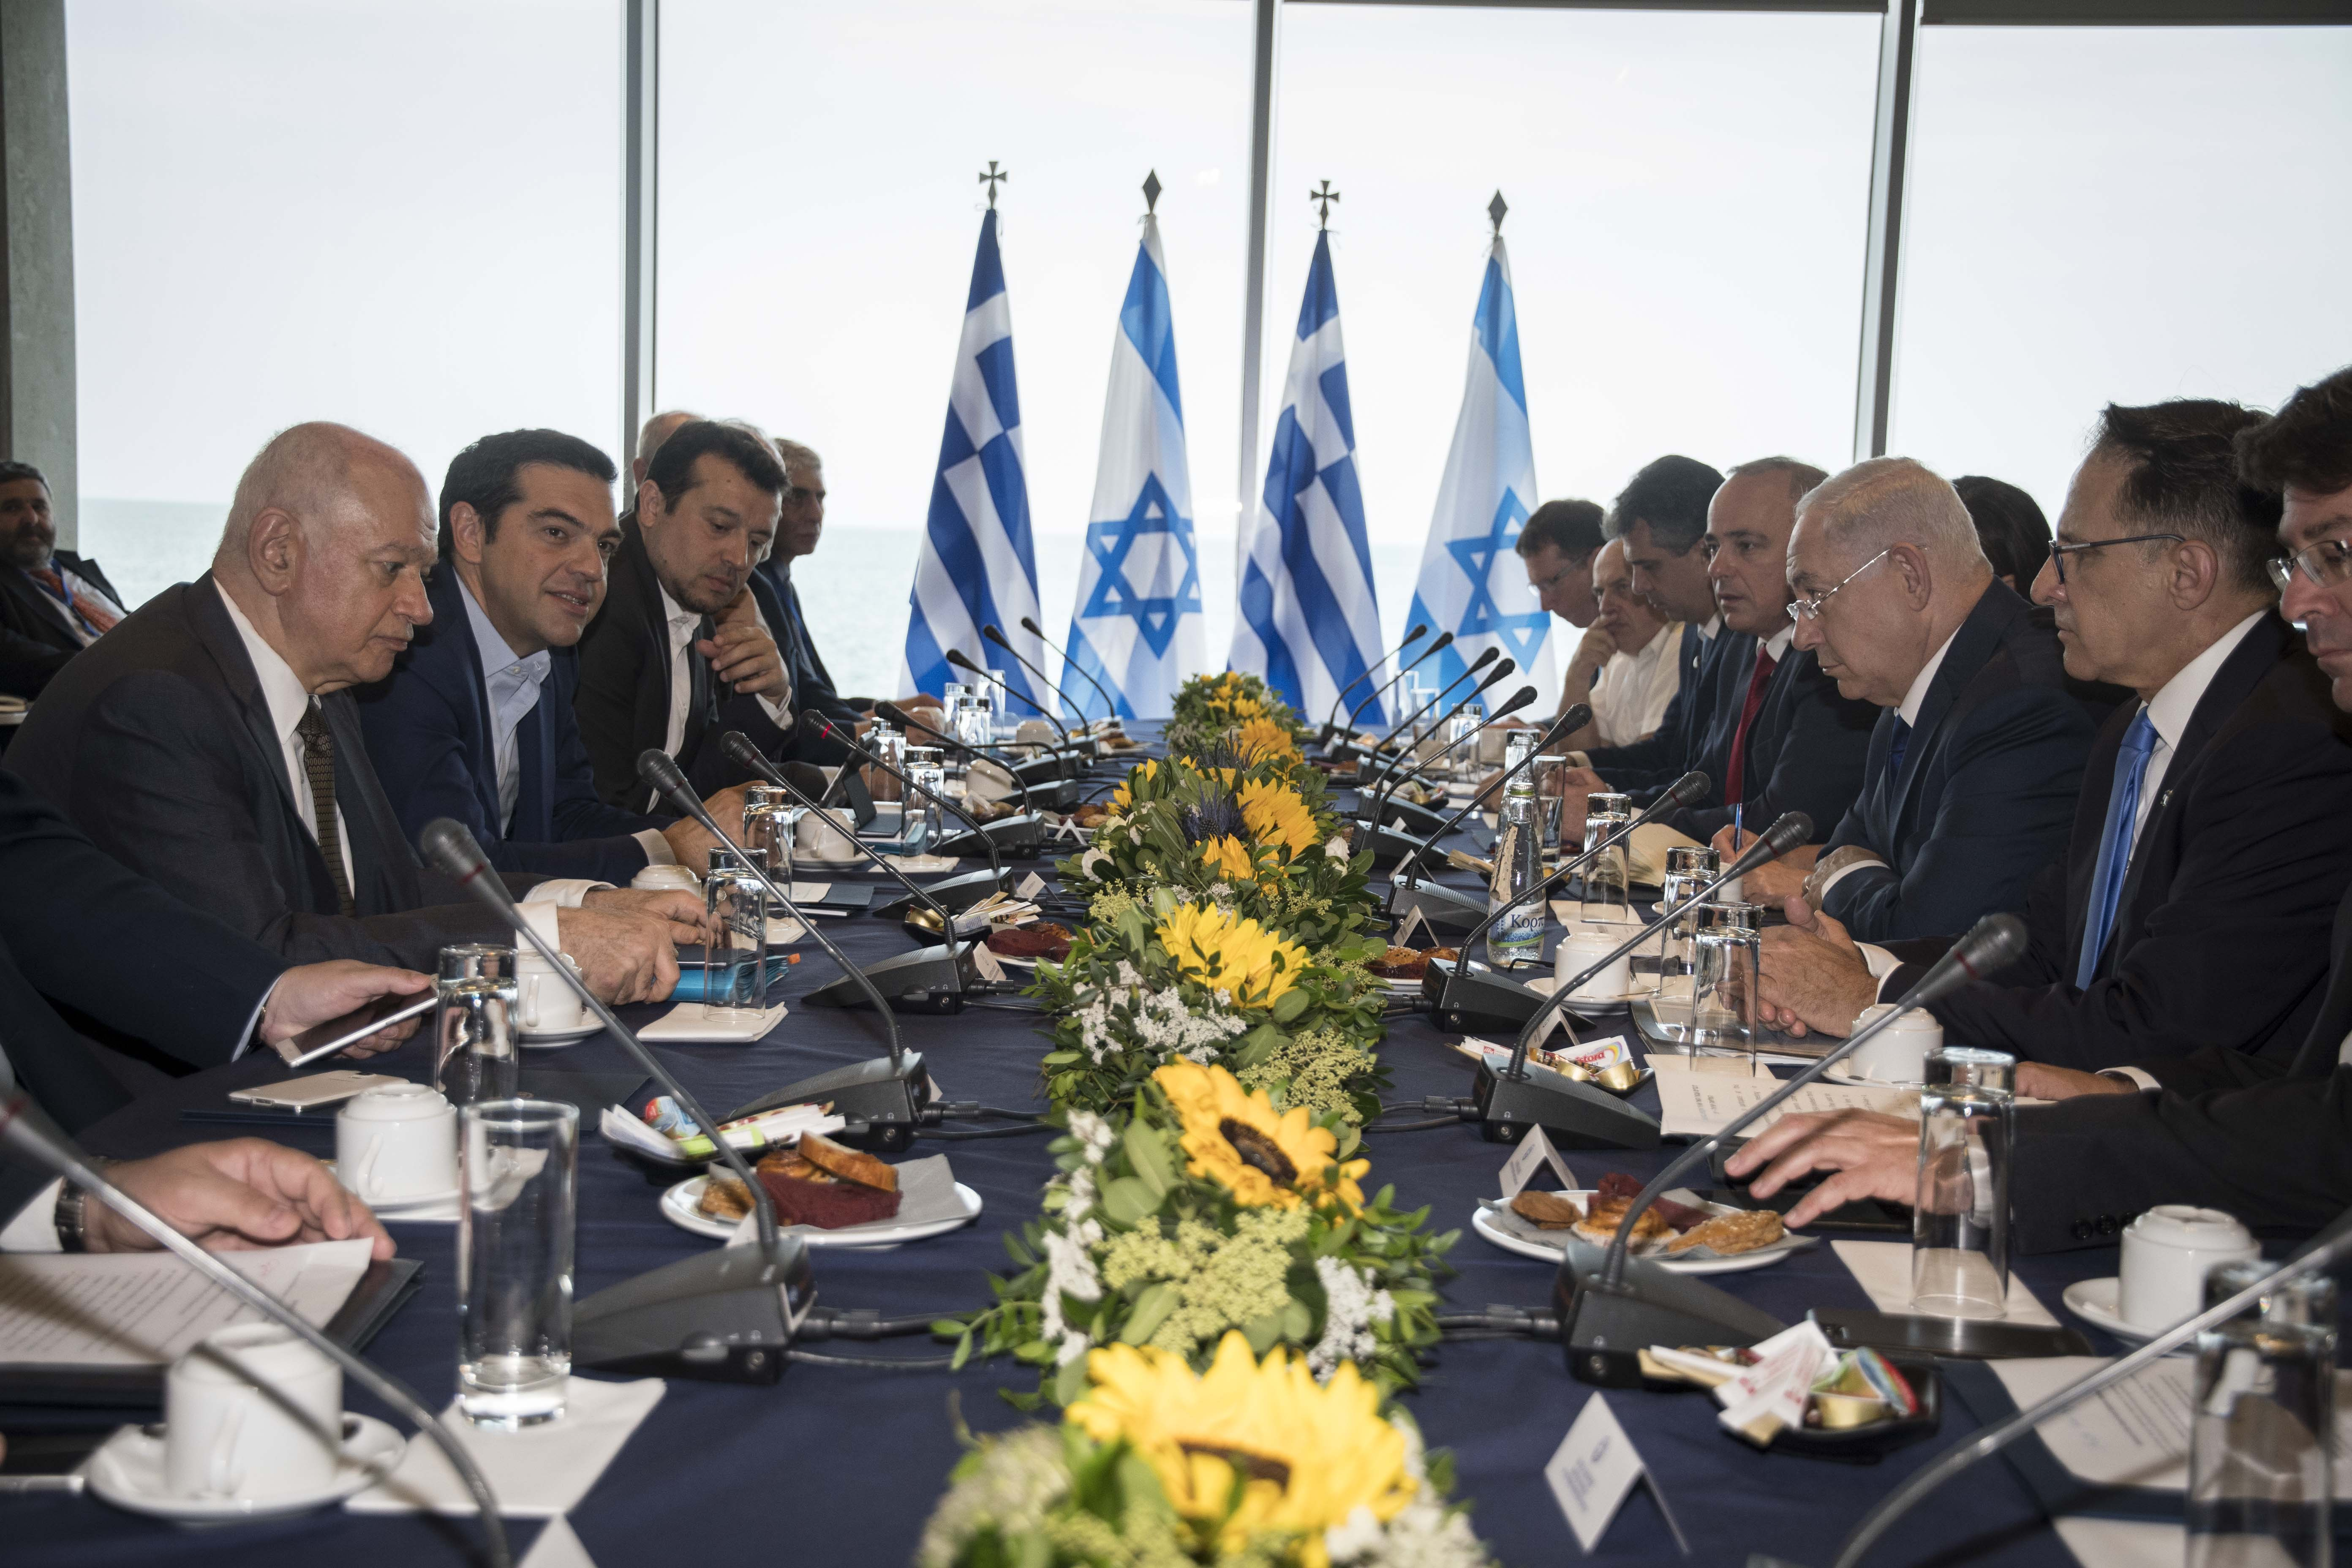 Greece Israel, Cyprus discuss energy puzzle in Mediterranean